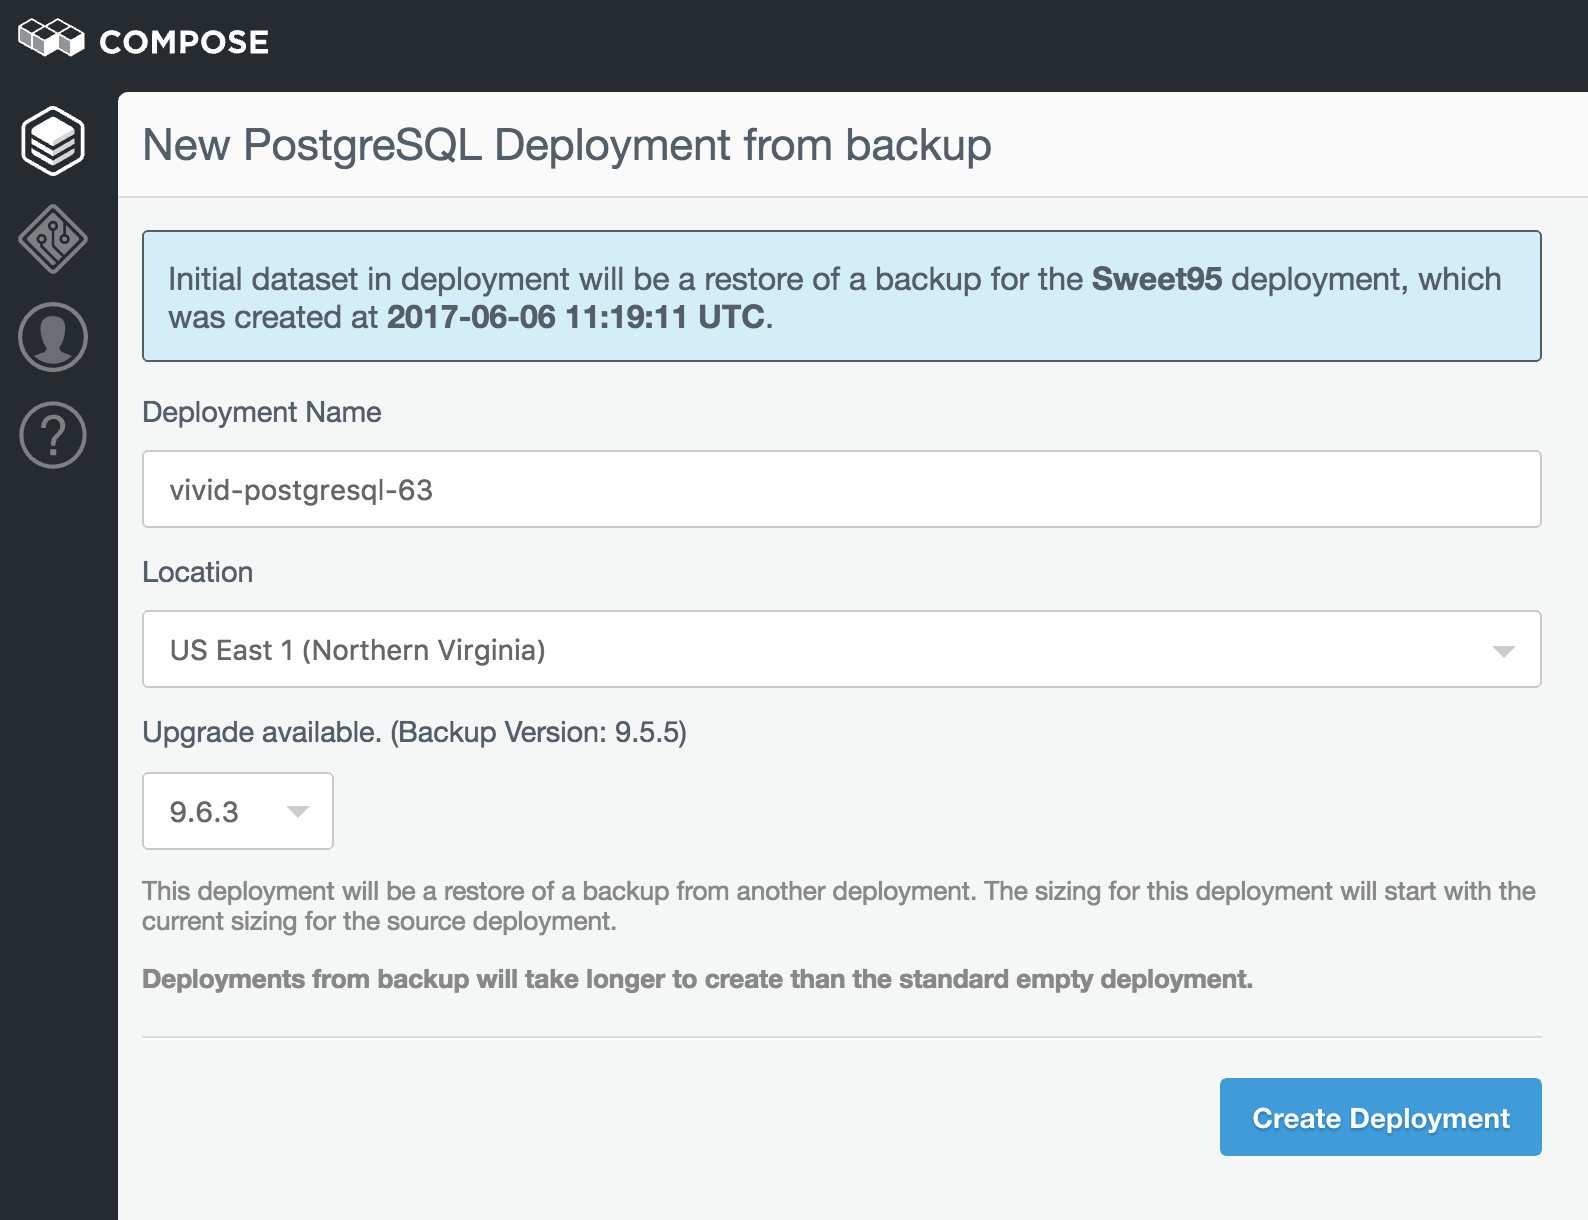 New PostgreSQL Deployment from backup